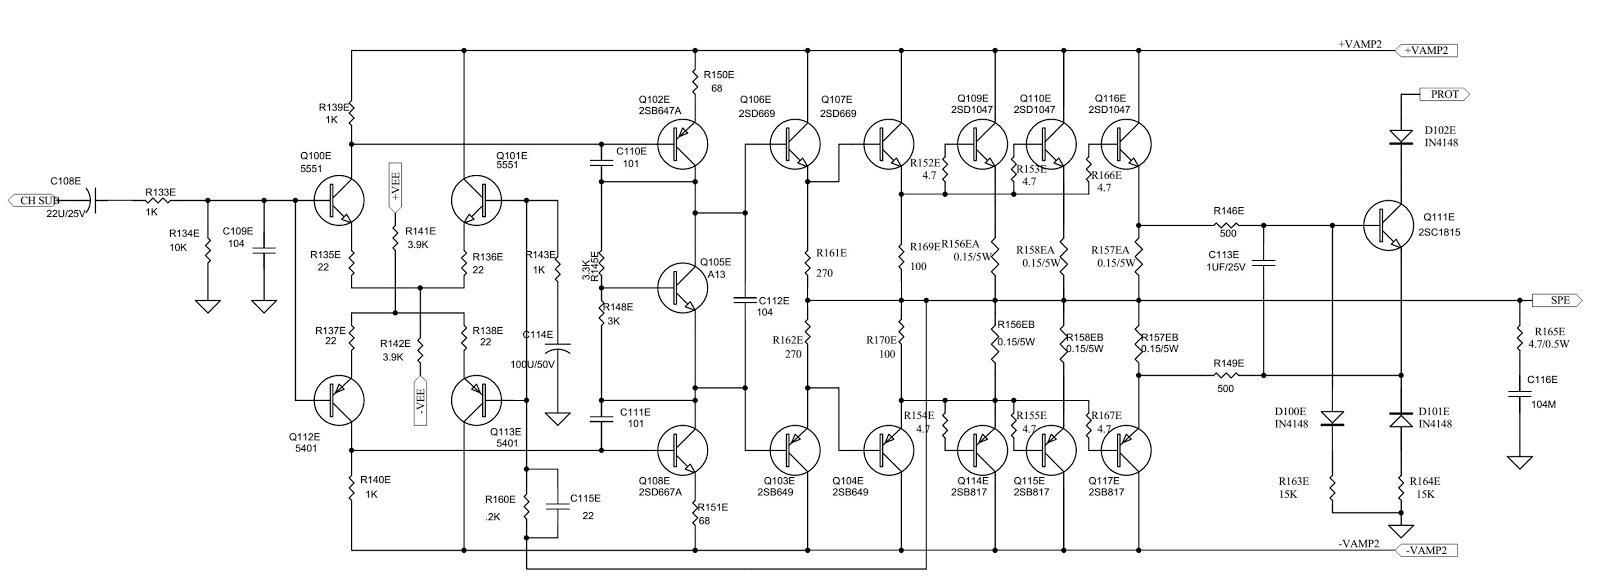 jbl amp circuit diagram enthusiast wiring diagrams u2022 toyota jbl stereo wiring diagram toyota jbl [ 1600 x 585 Pixel ]